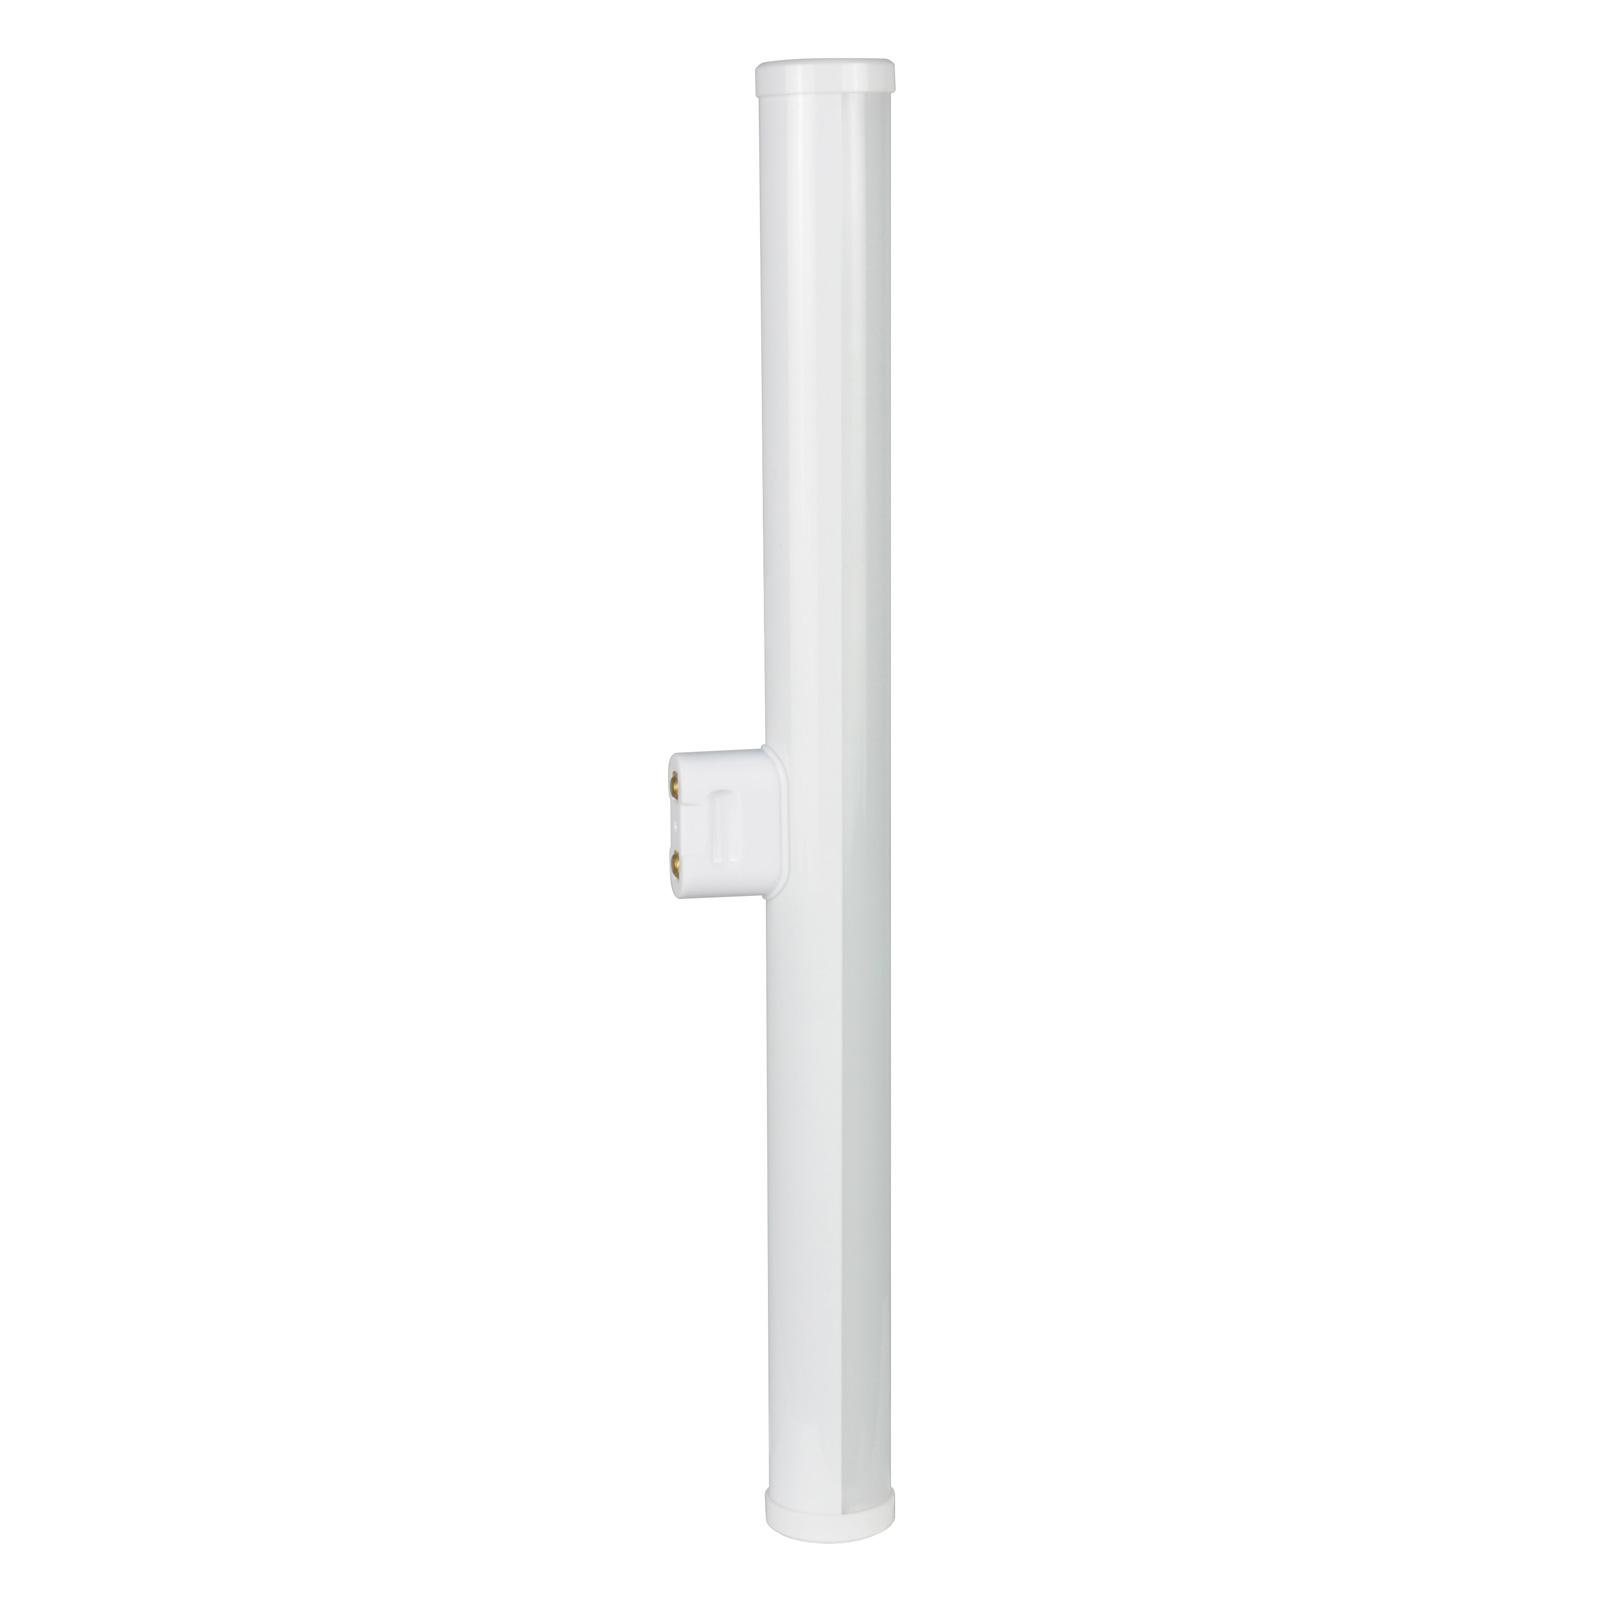 Żarówka liniowa LED S14d, 5W 827 1 cokół 500 mm